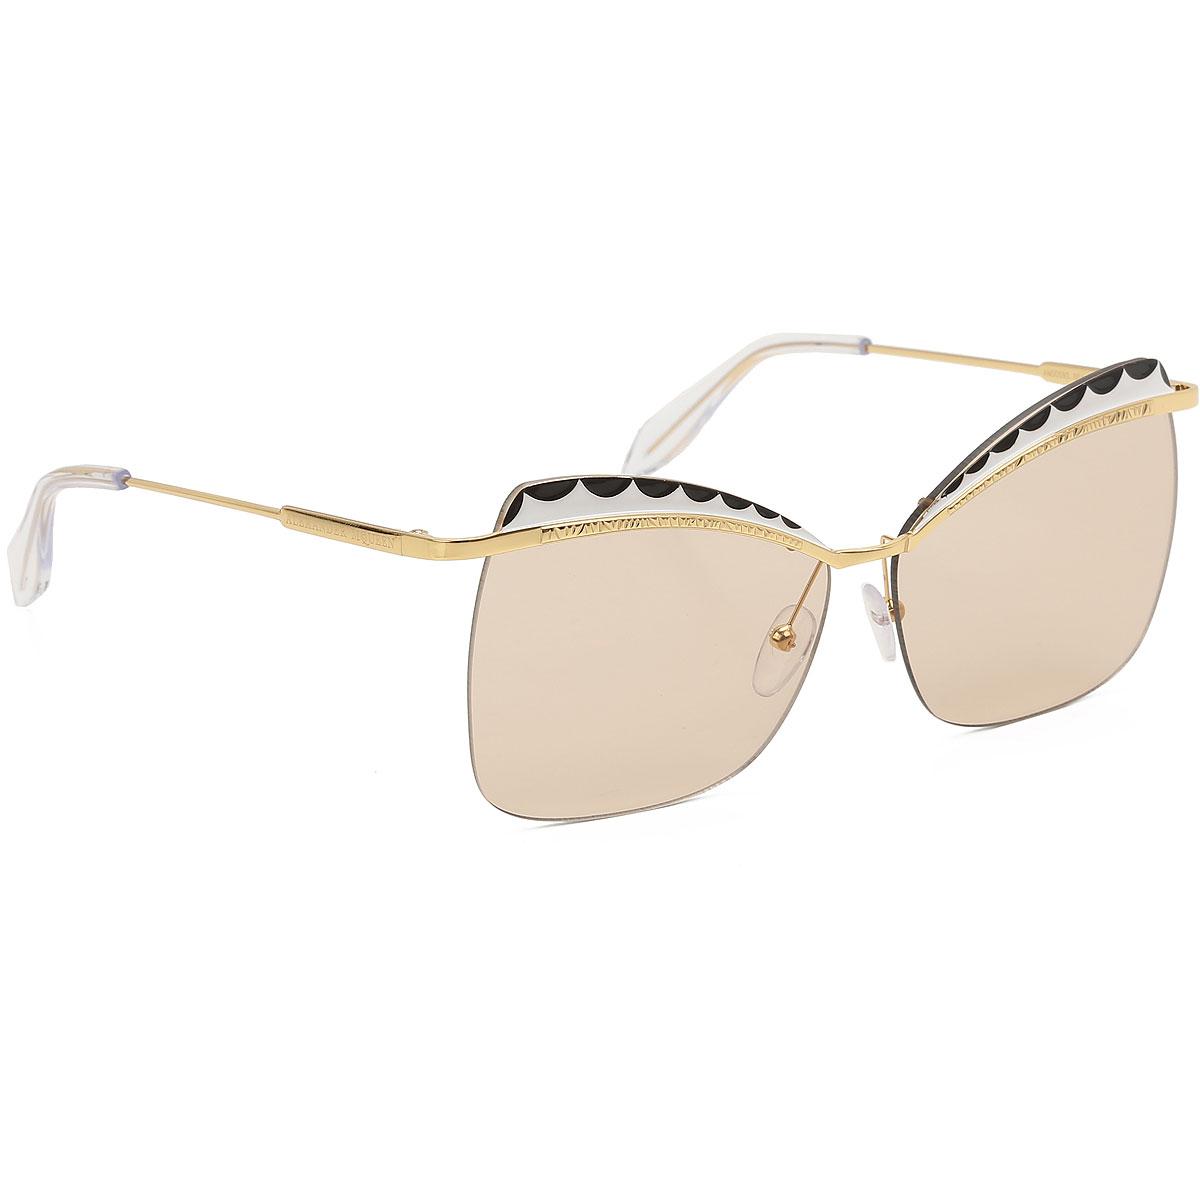 Alexander McQueen Sunglasses On Sale, Gold, 2019